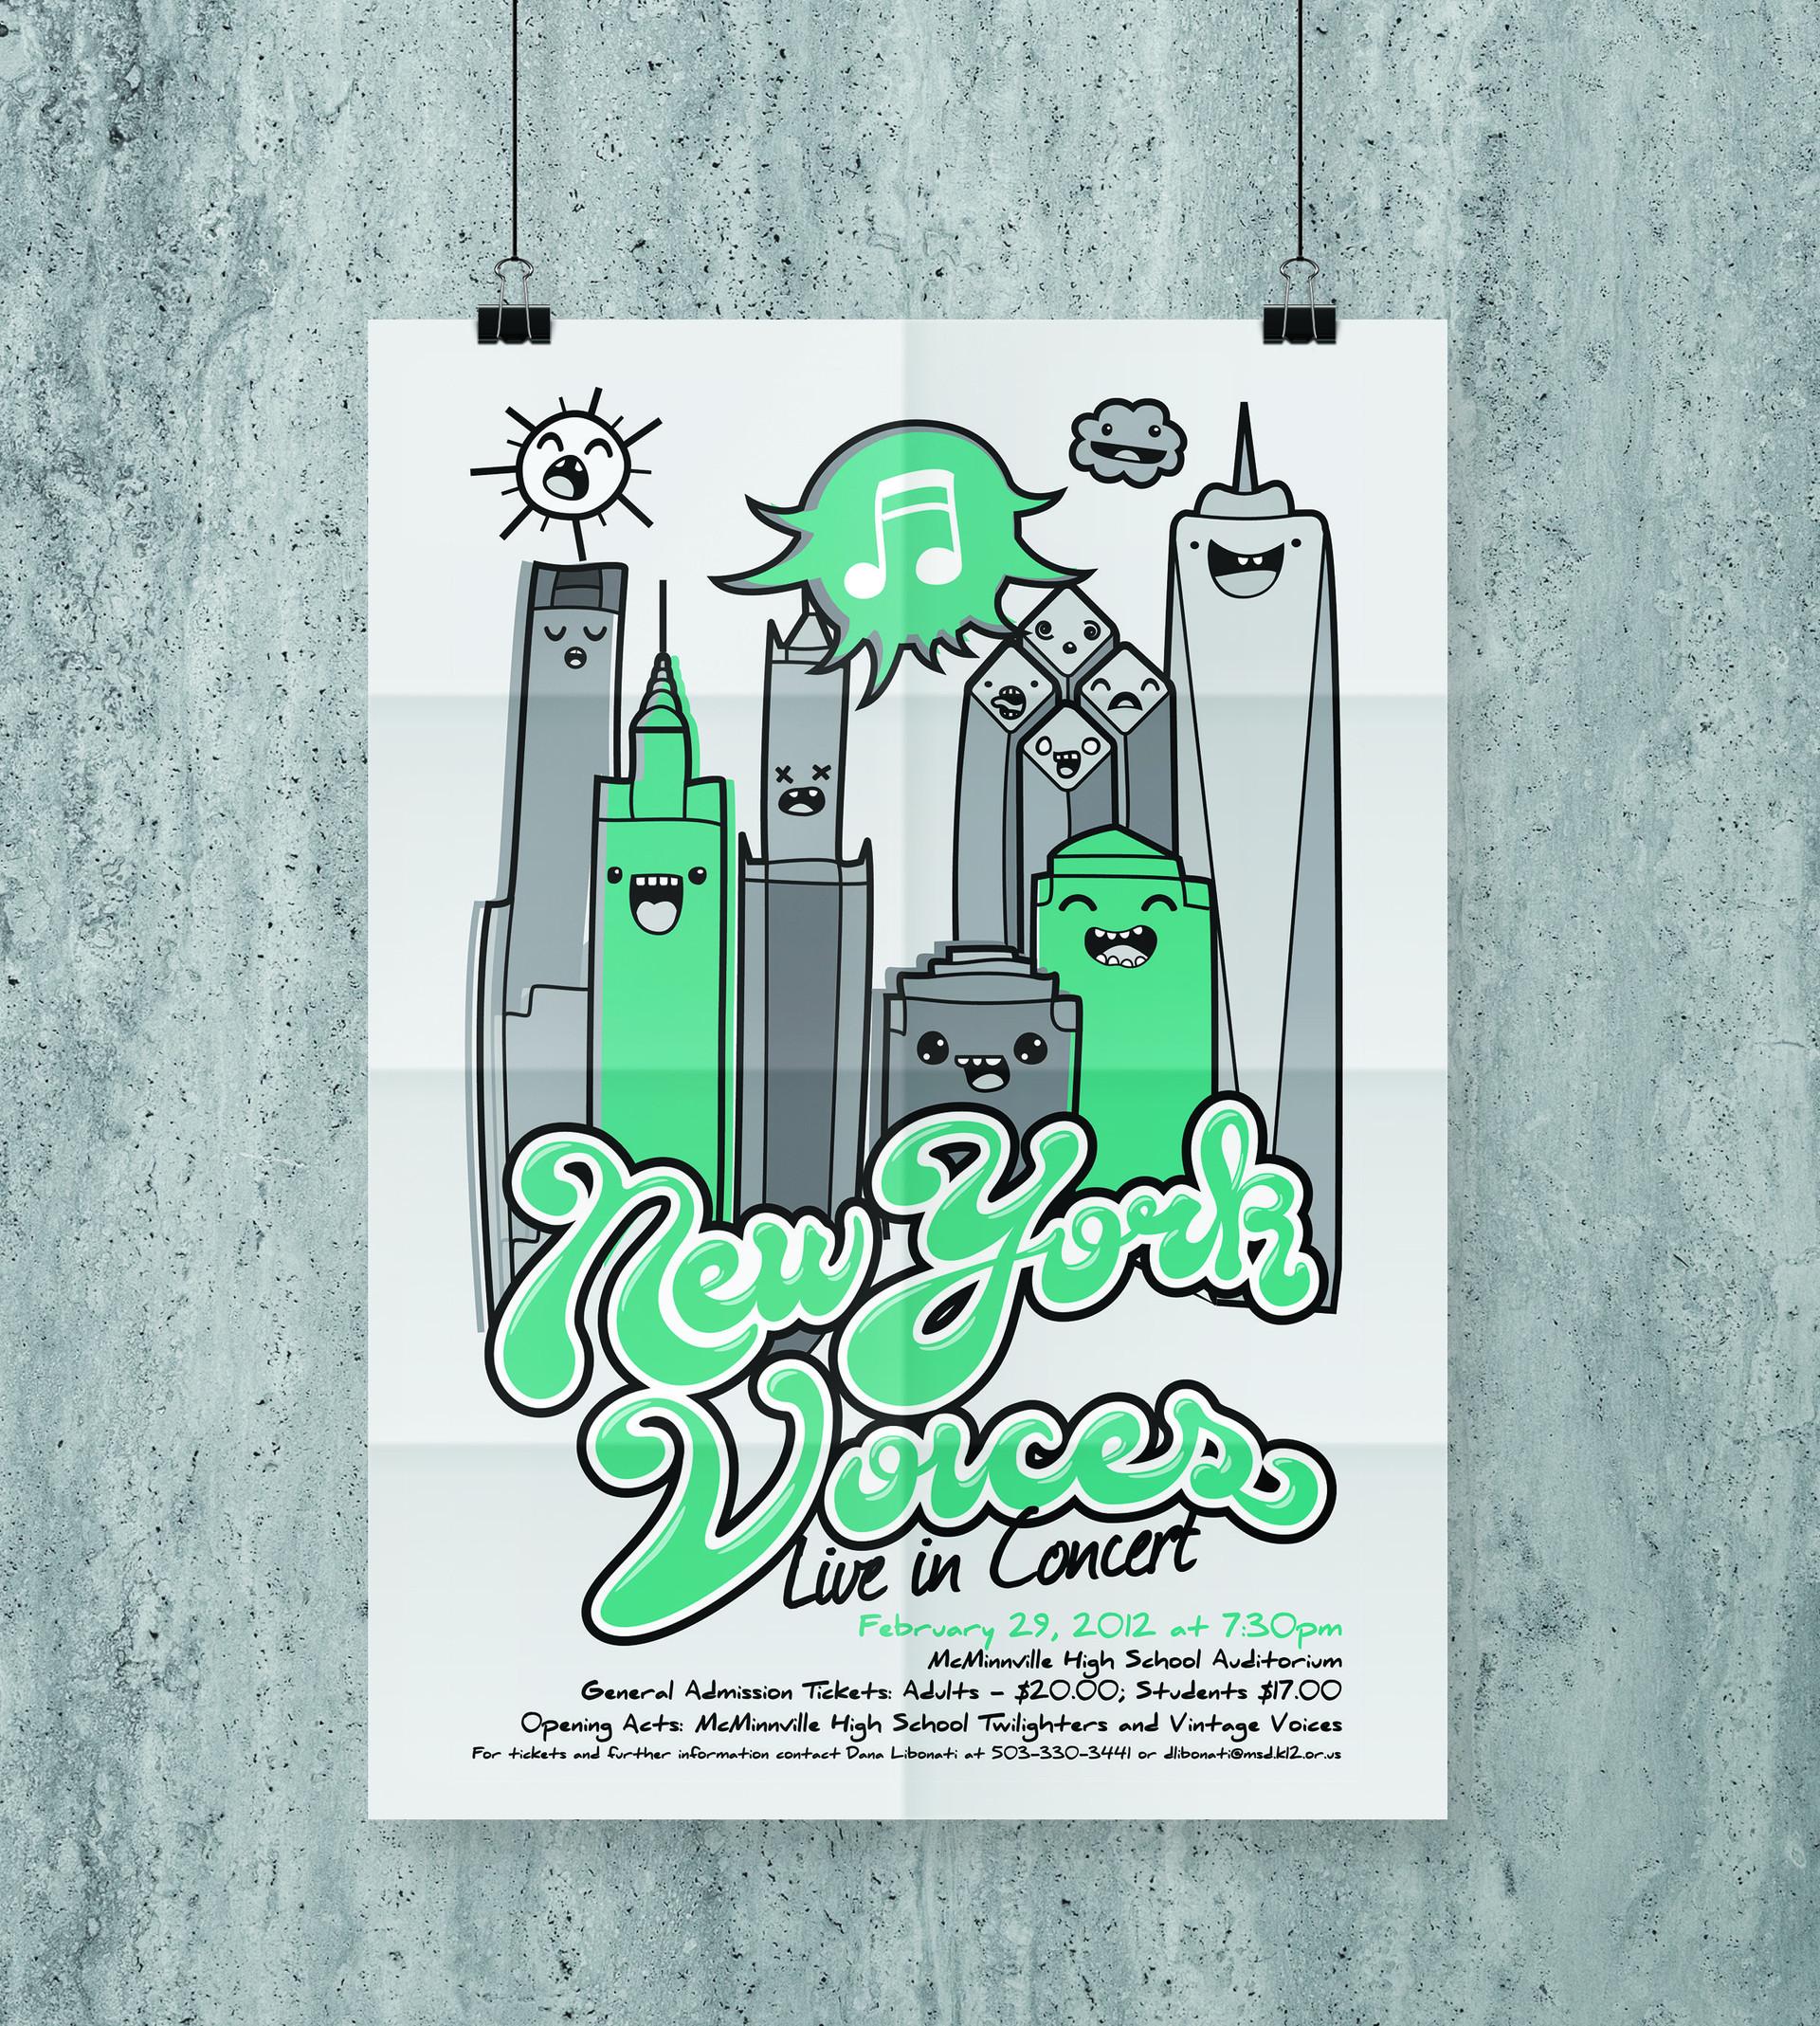 PosterMockup_NYVConcert1.jpg